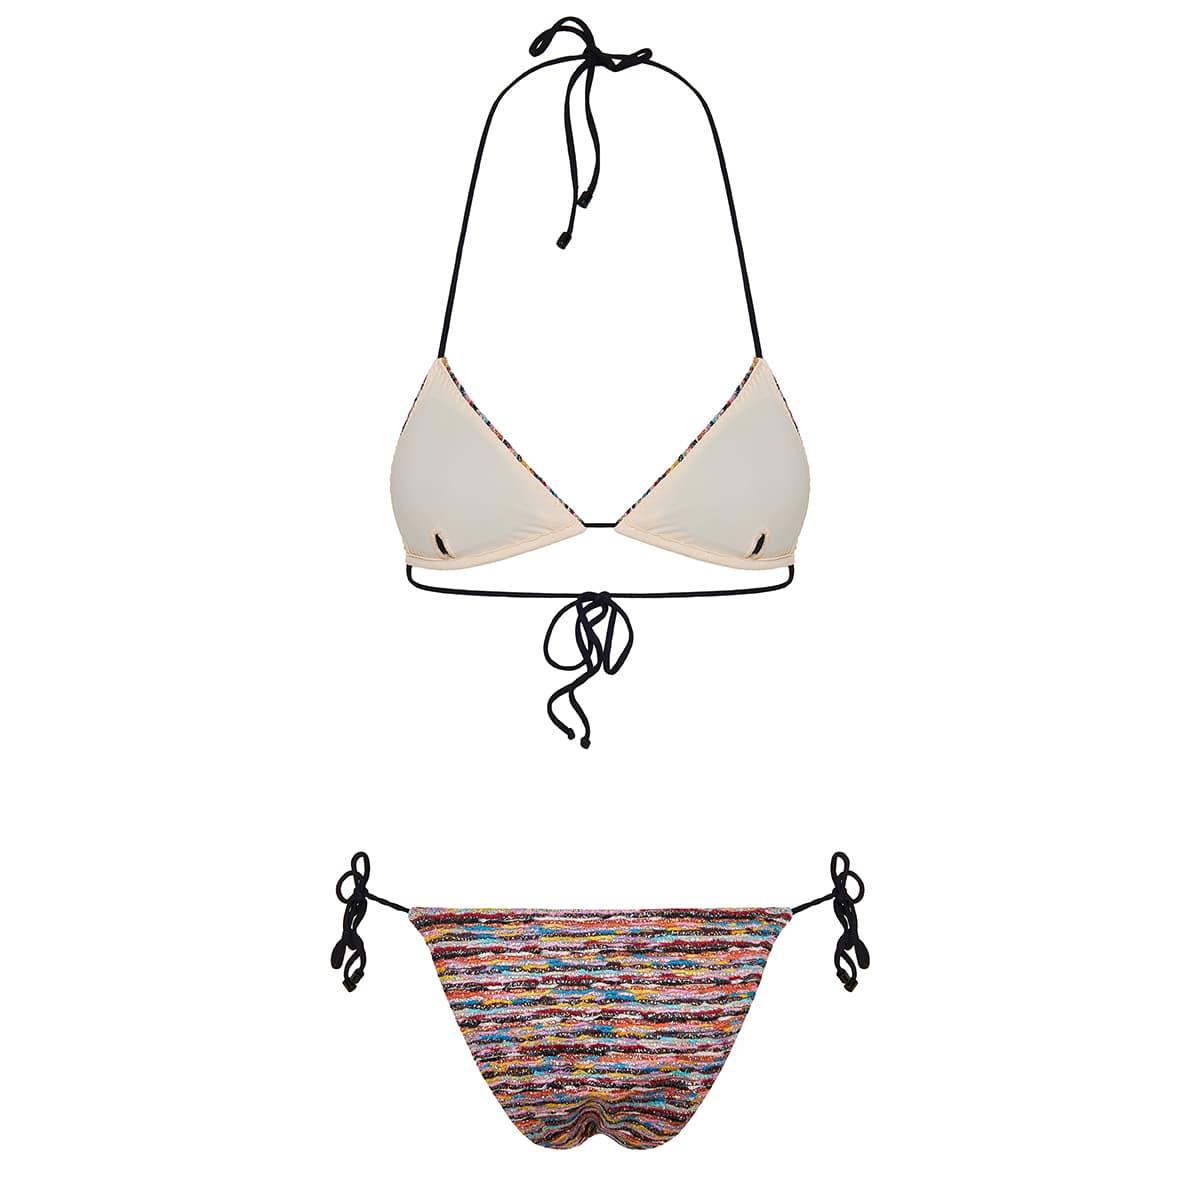 Lurex knitted bikini